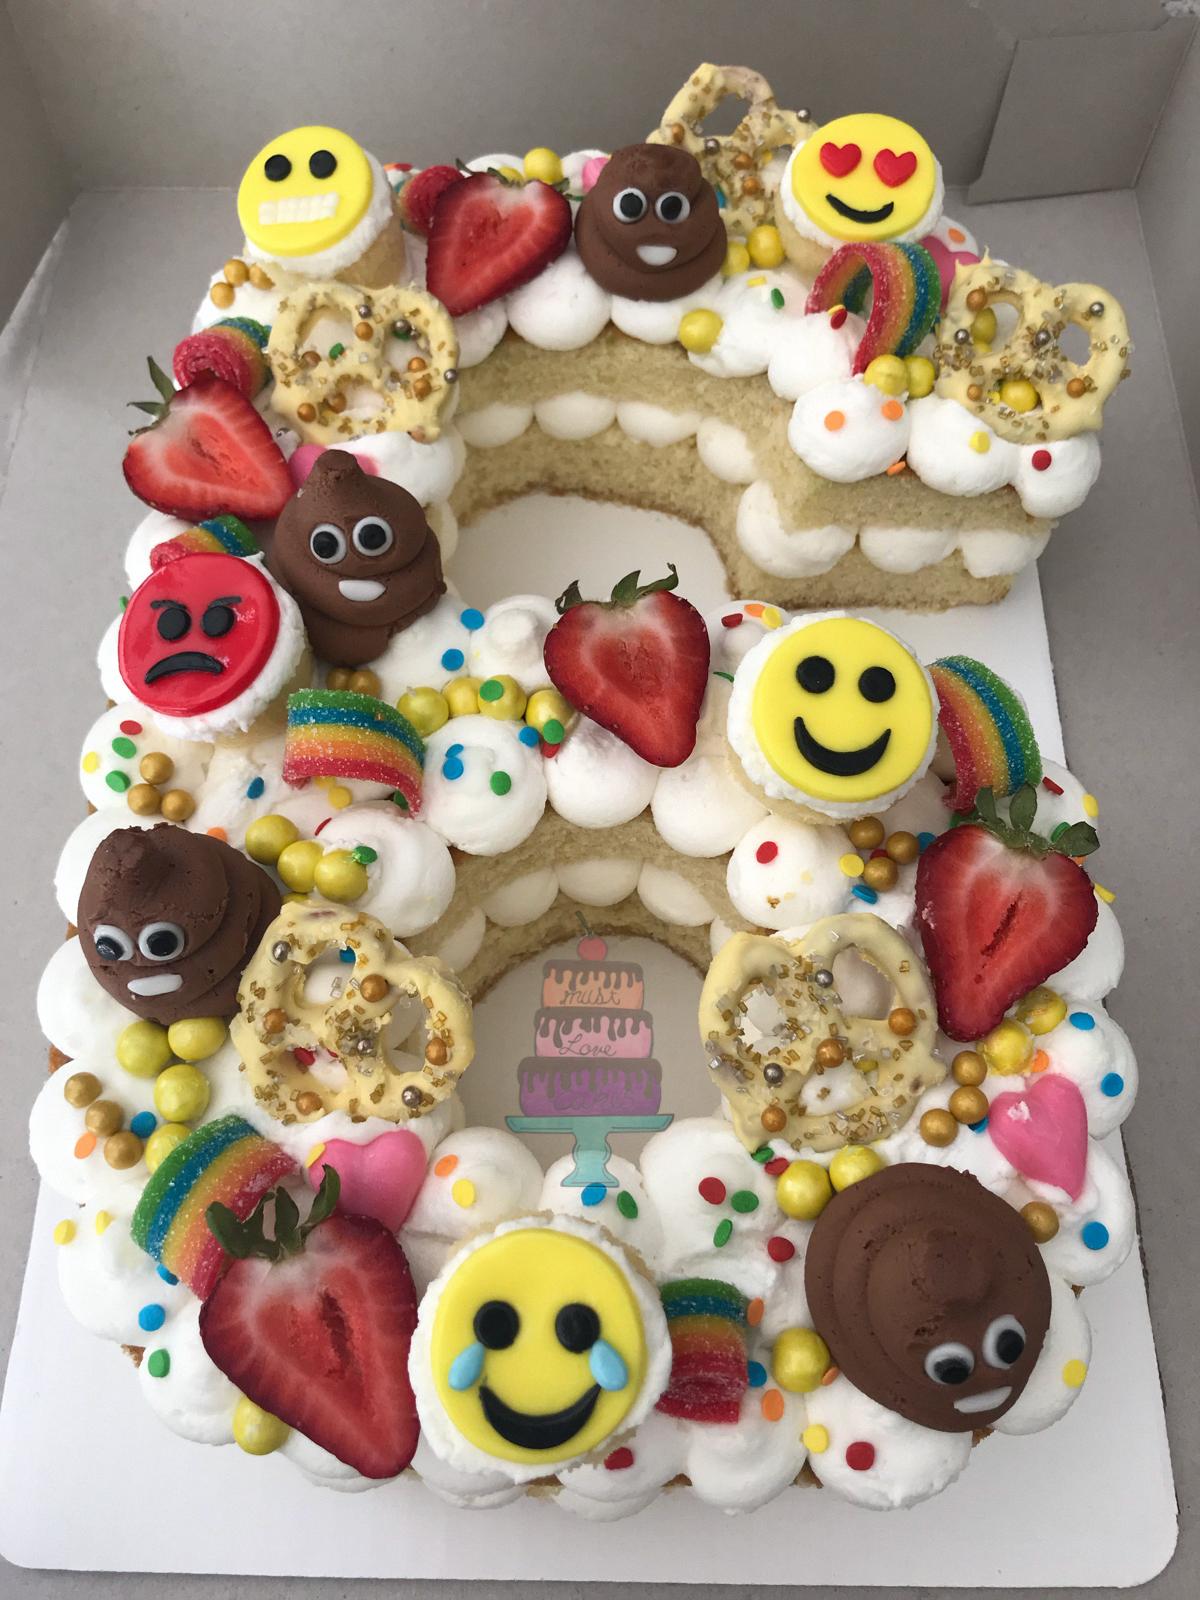 Birthday Cake Emoji Emoji Birthday Emoji Birthday Cake Iphone Cake